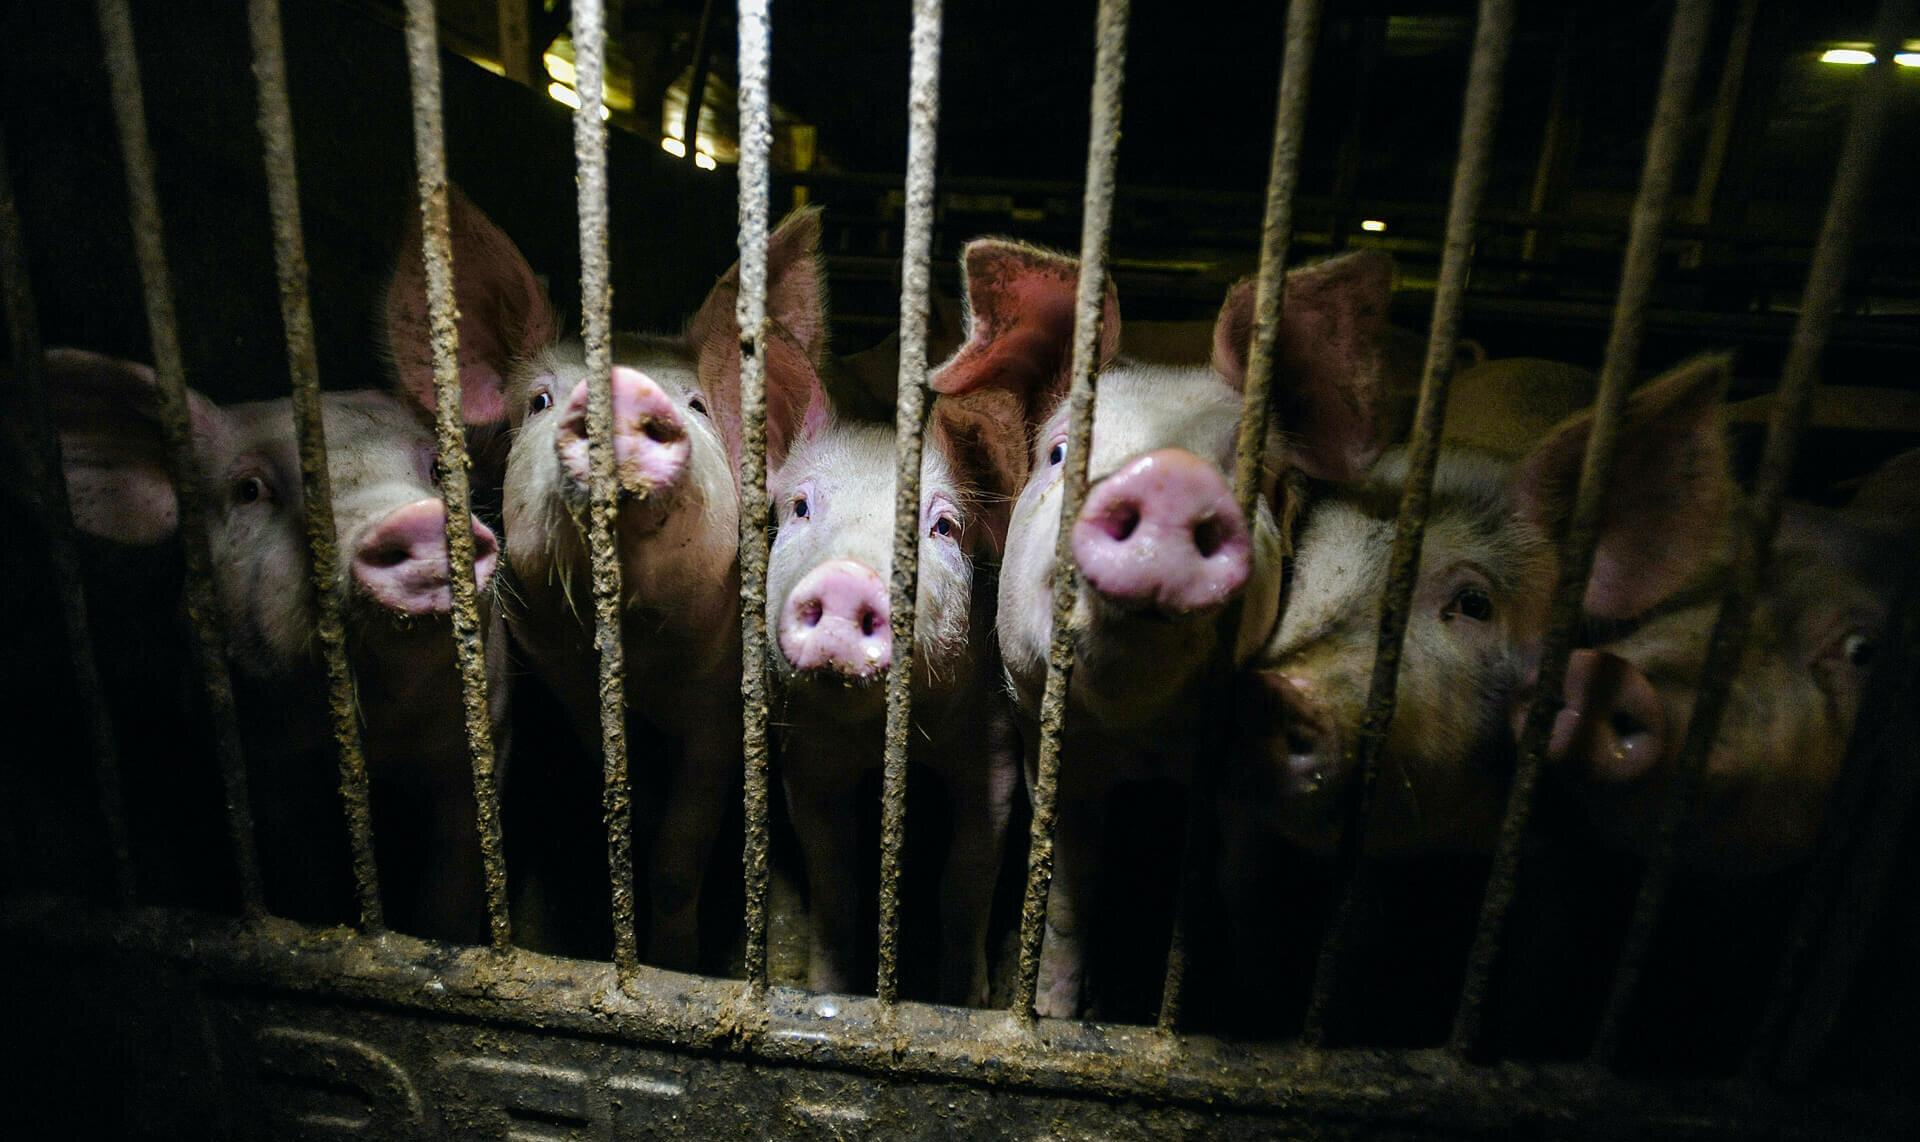 Industrial pig farming.